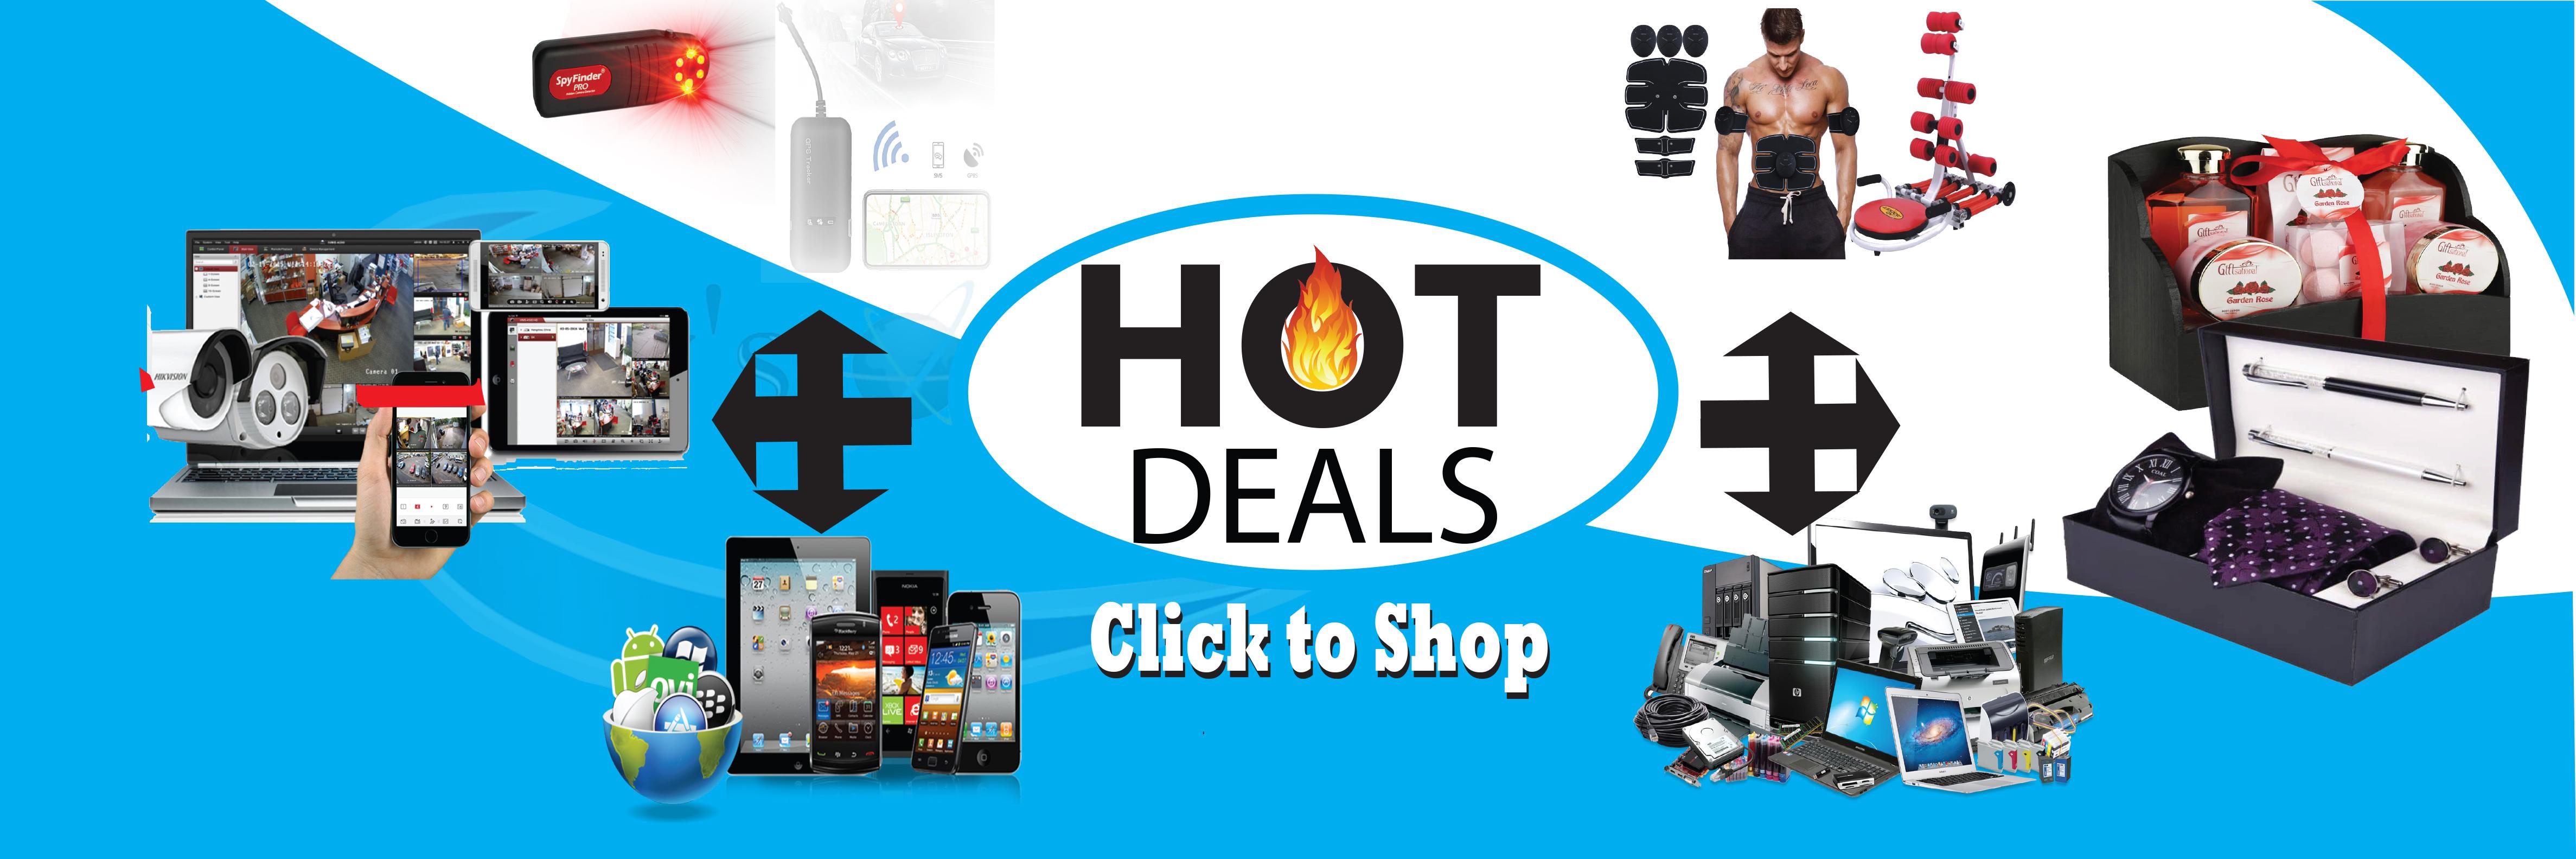 hot-dealsmkyo6w.jpg